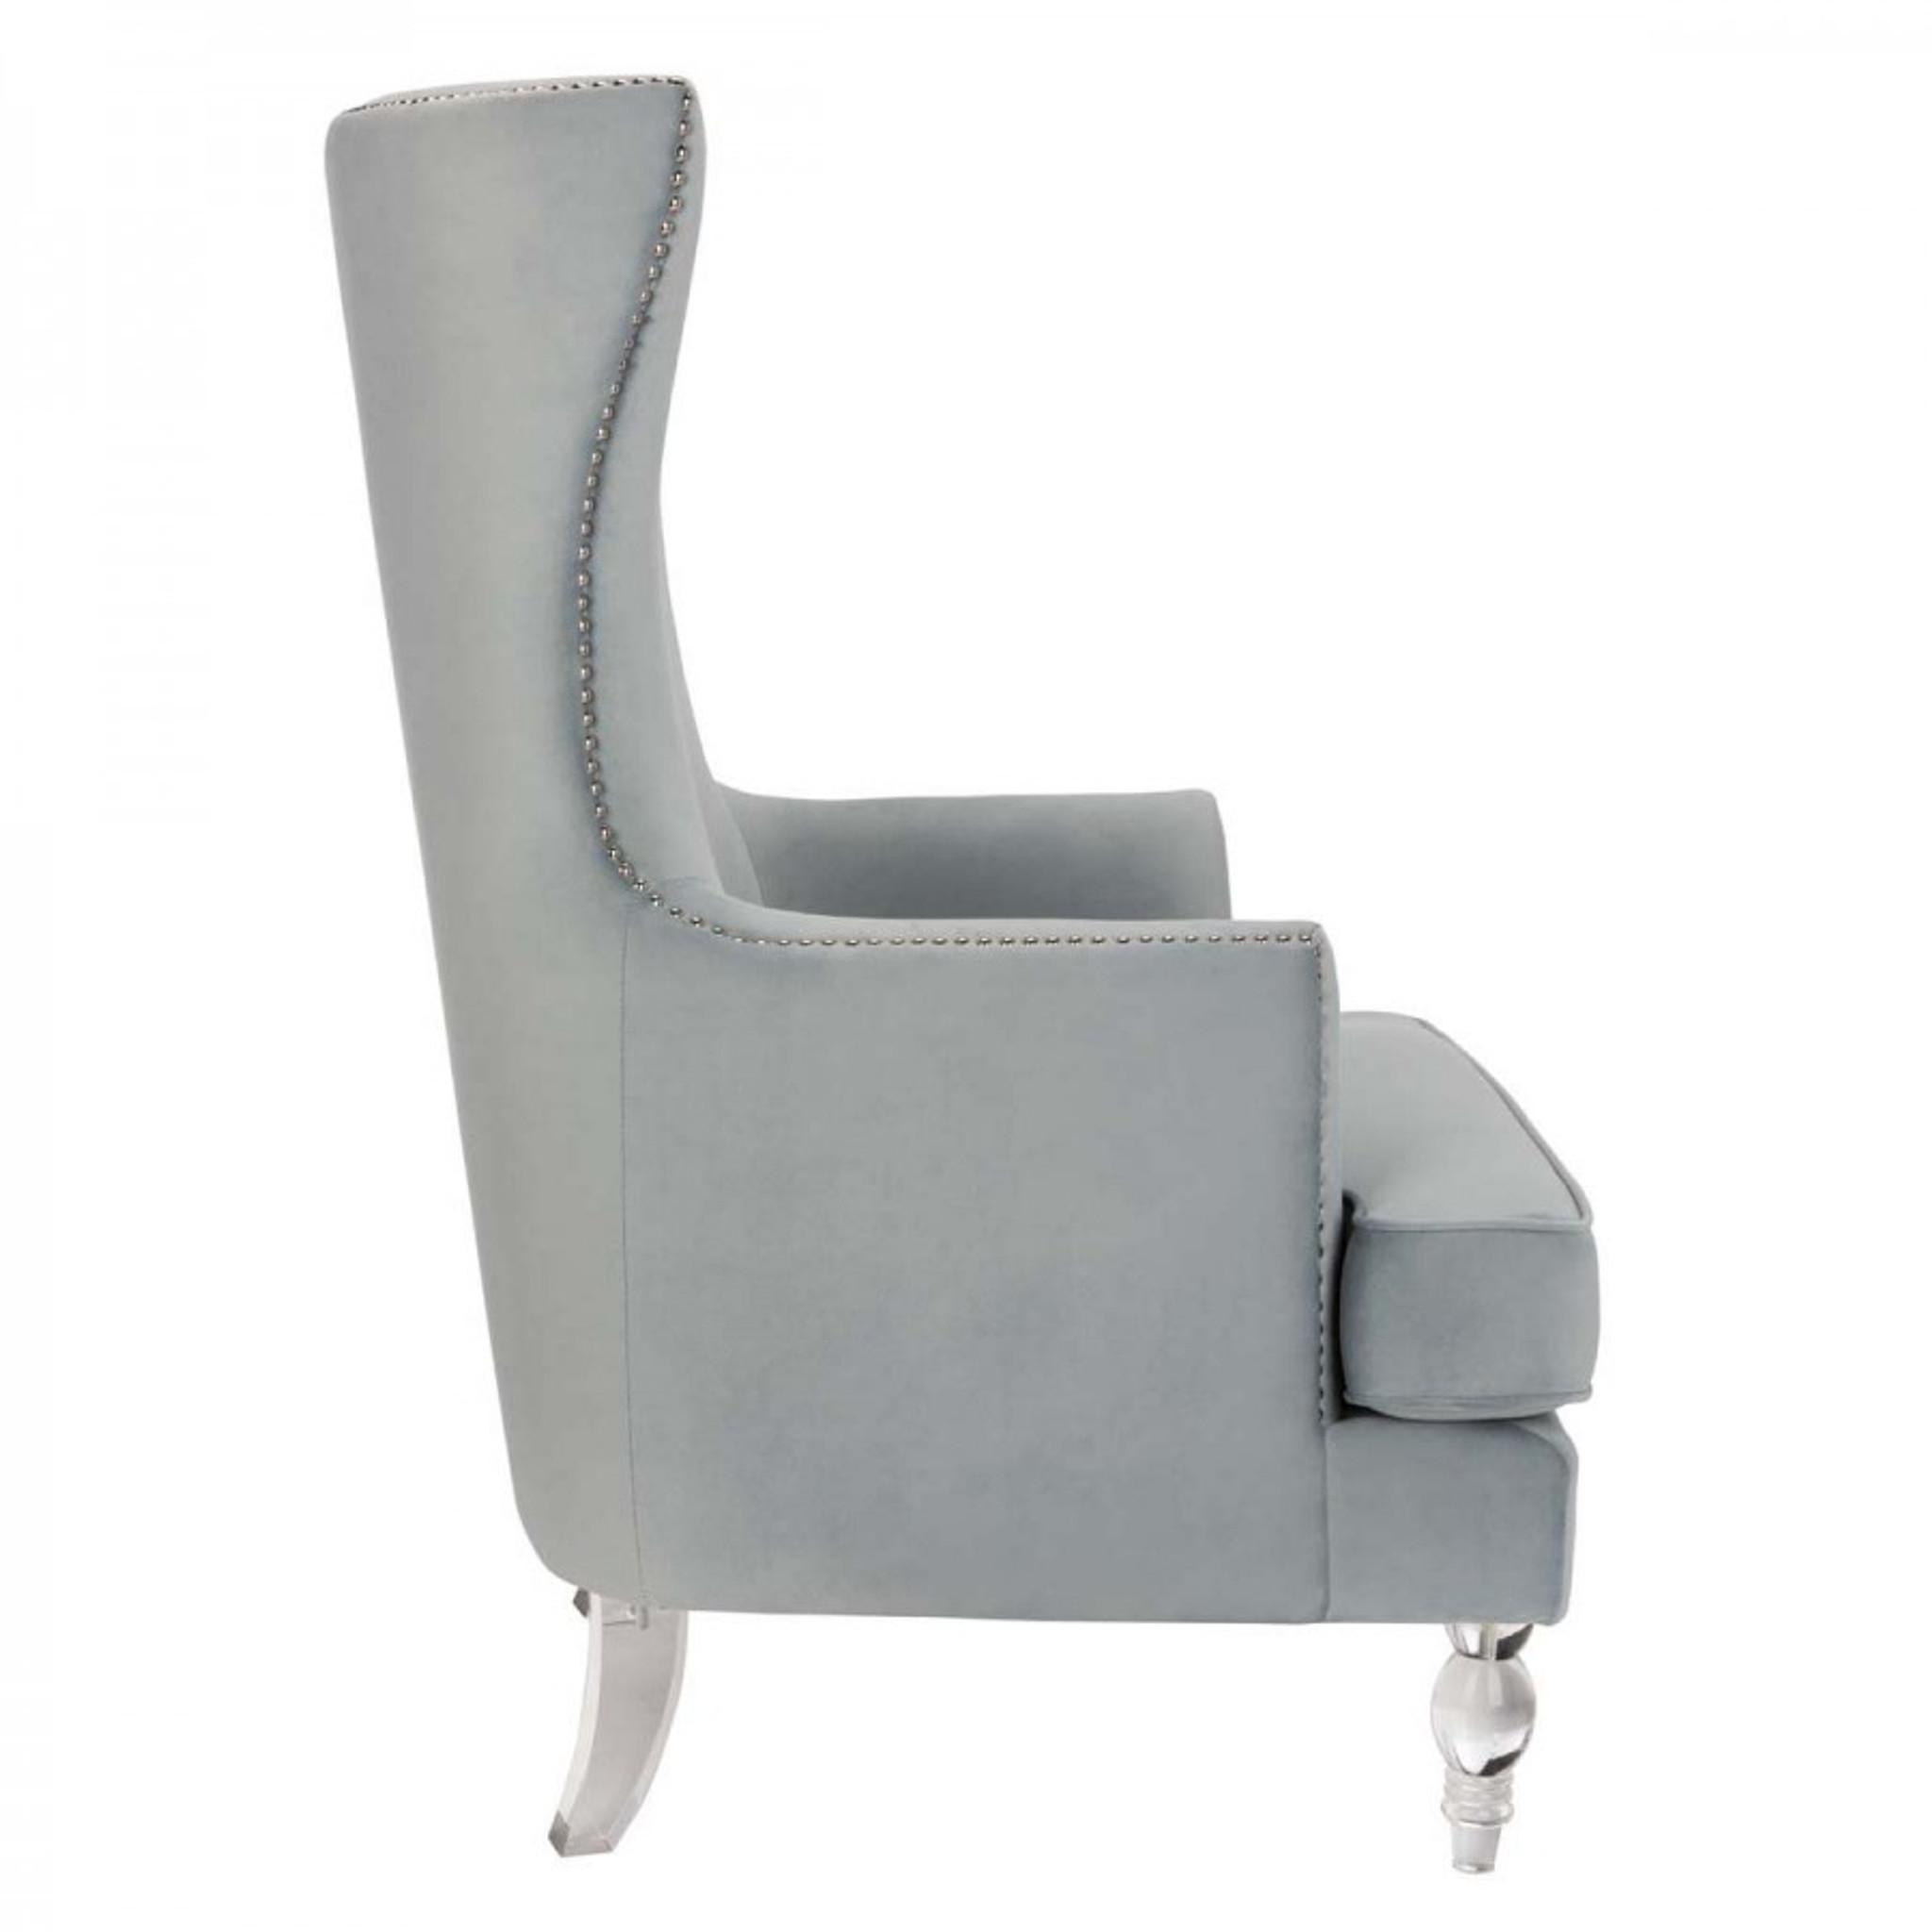 clear lucite leg silver nailheads light grey velvet high back wing chair modern decor Geode Modern Wingback Chair - Light Silver